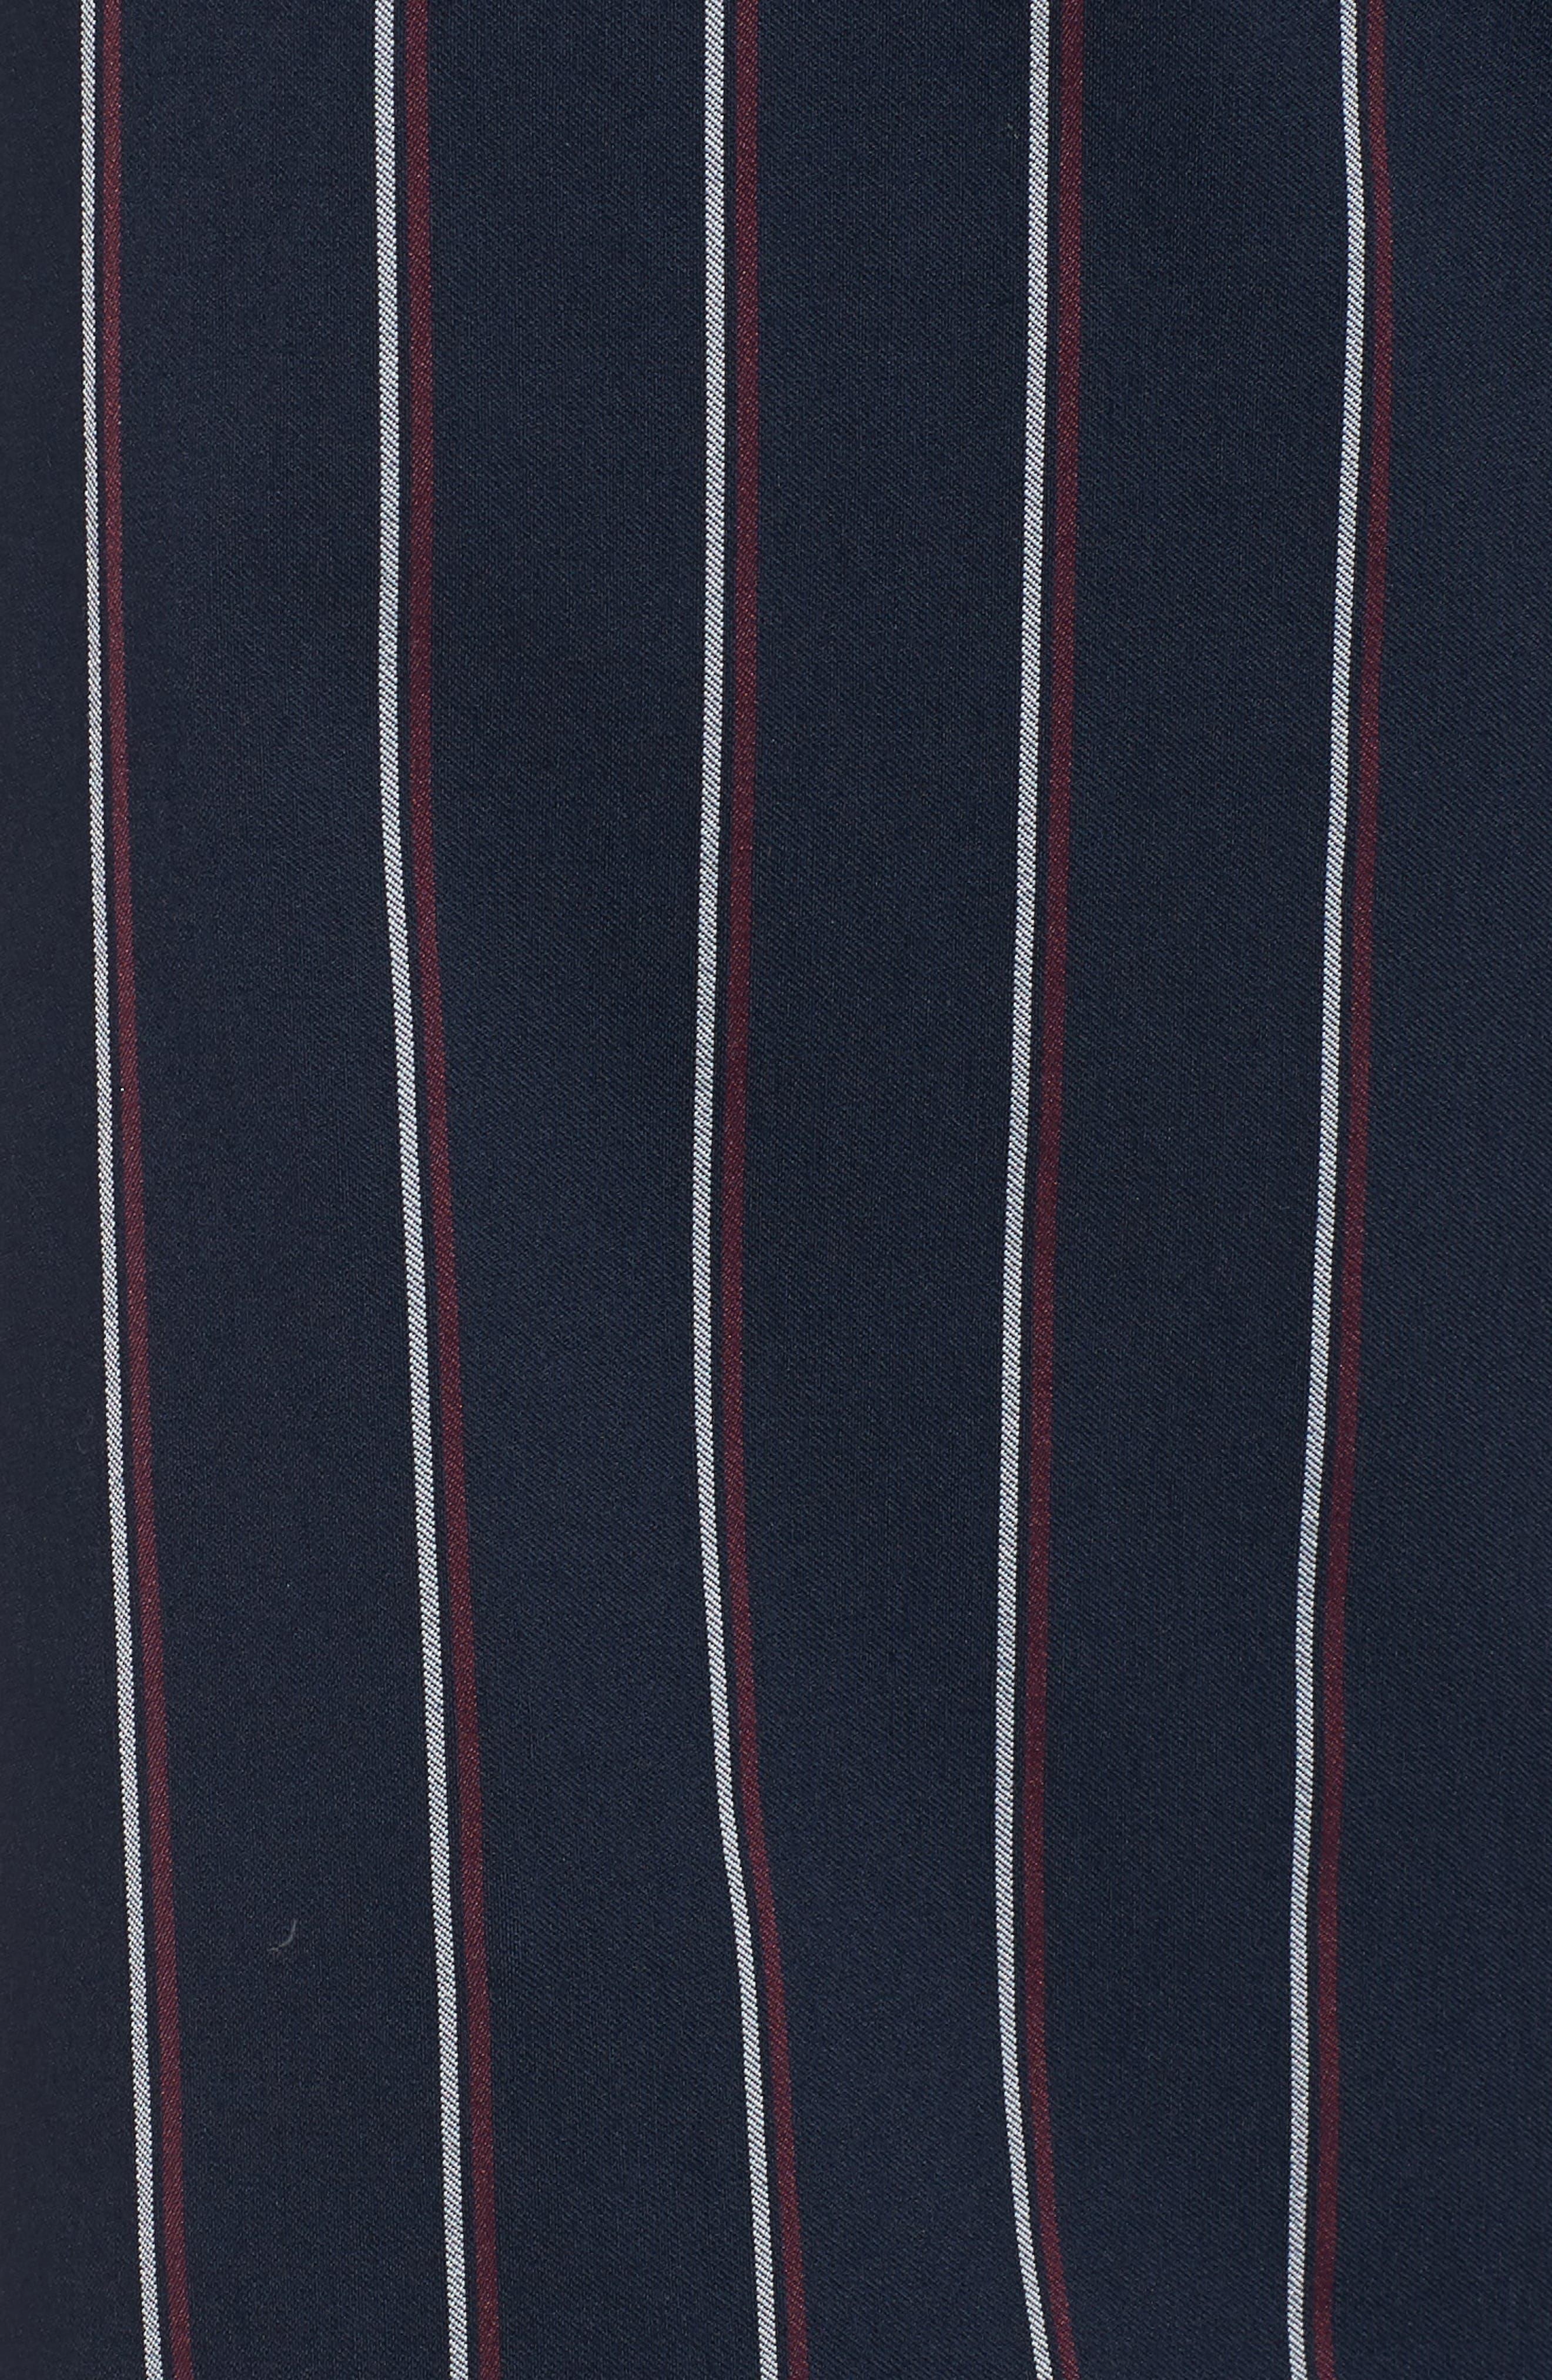 Tie Waist Crop Trousers,                             Alternate thumbnail 6, color,                             Navy Night Stripe